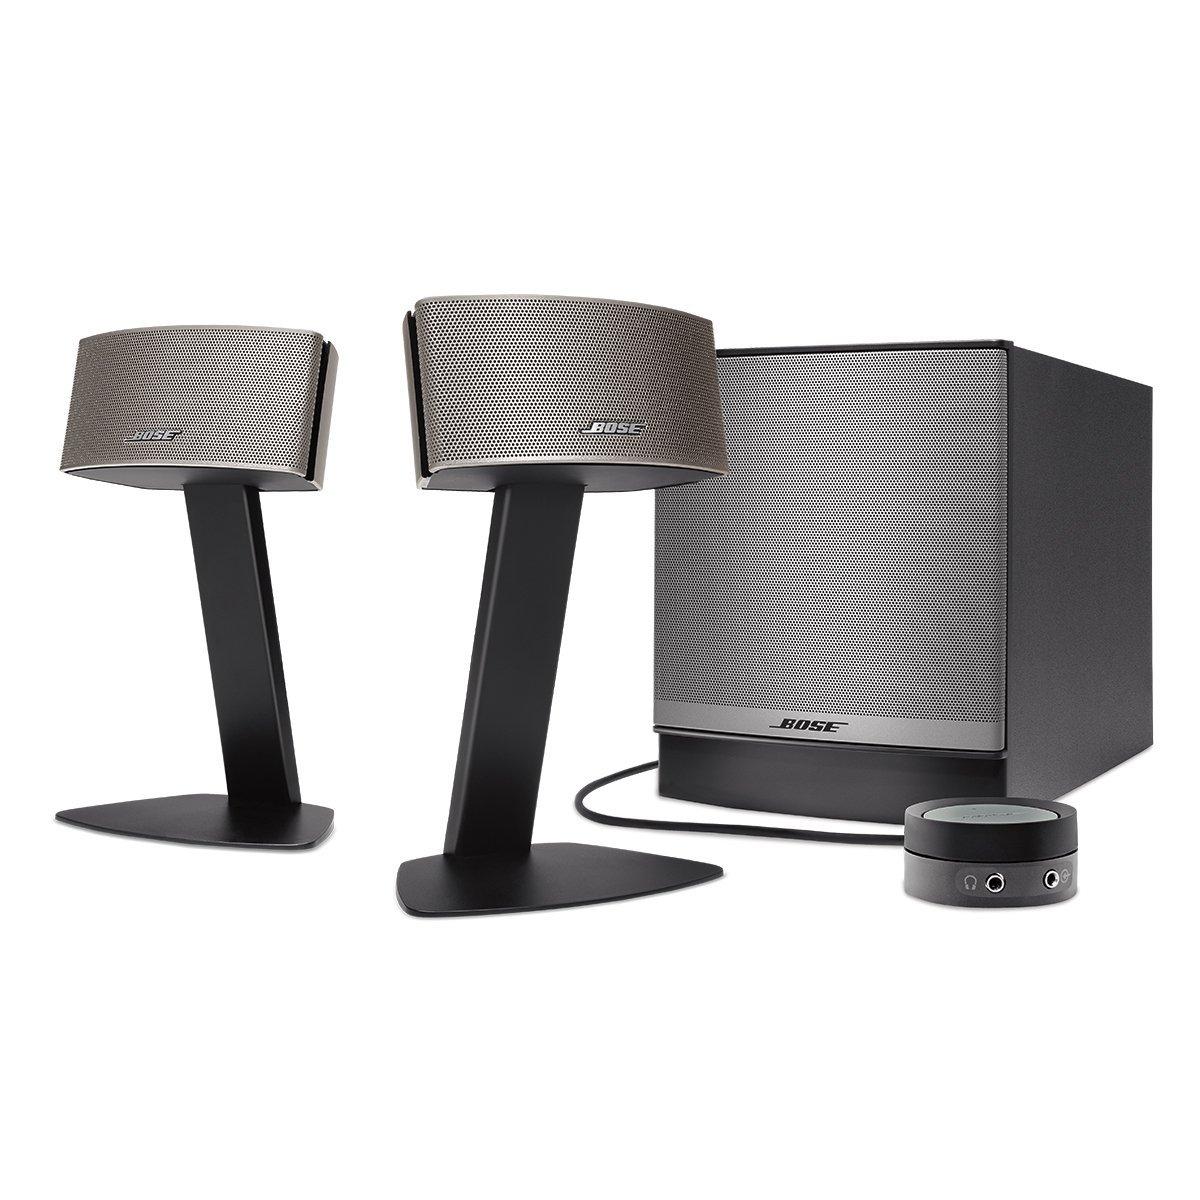 Bose Companion 50 Multimedia Lautsprechersystem für 270,22€ (Amazon.es)